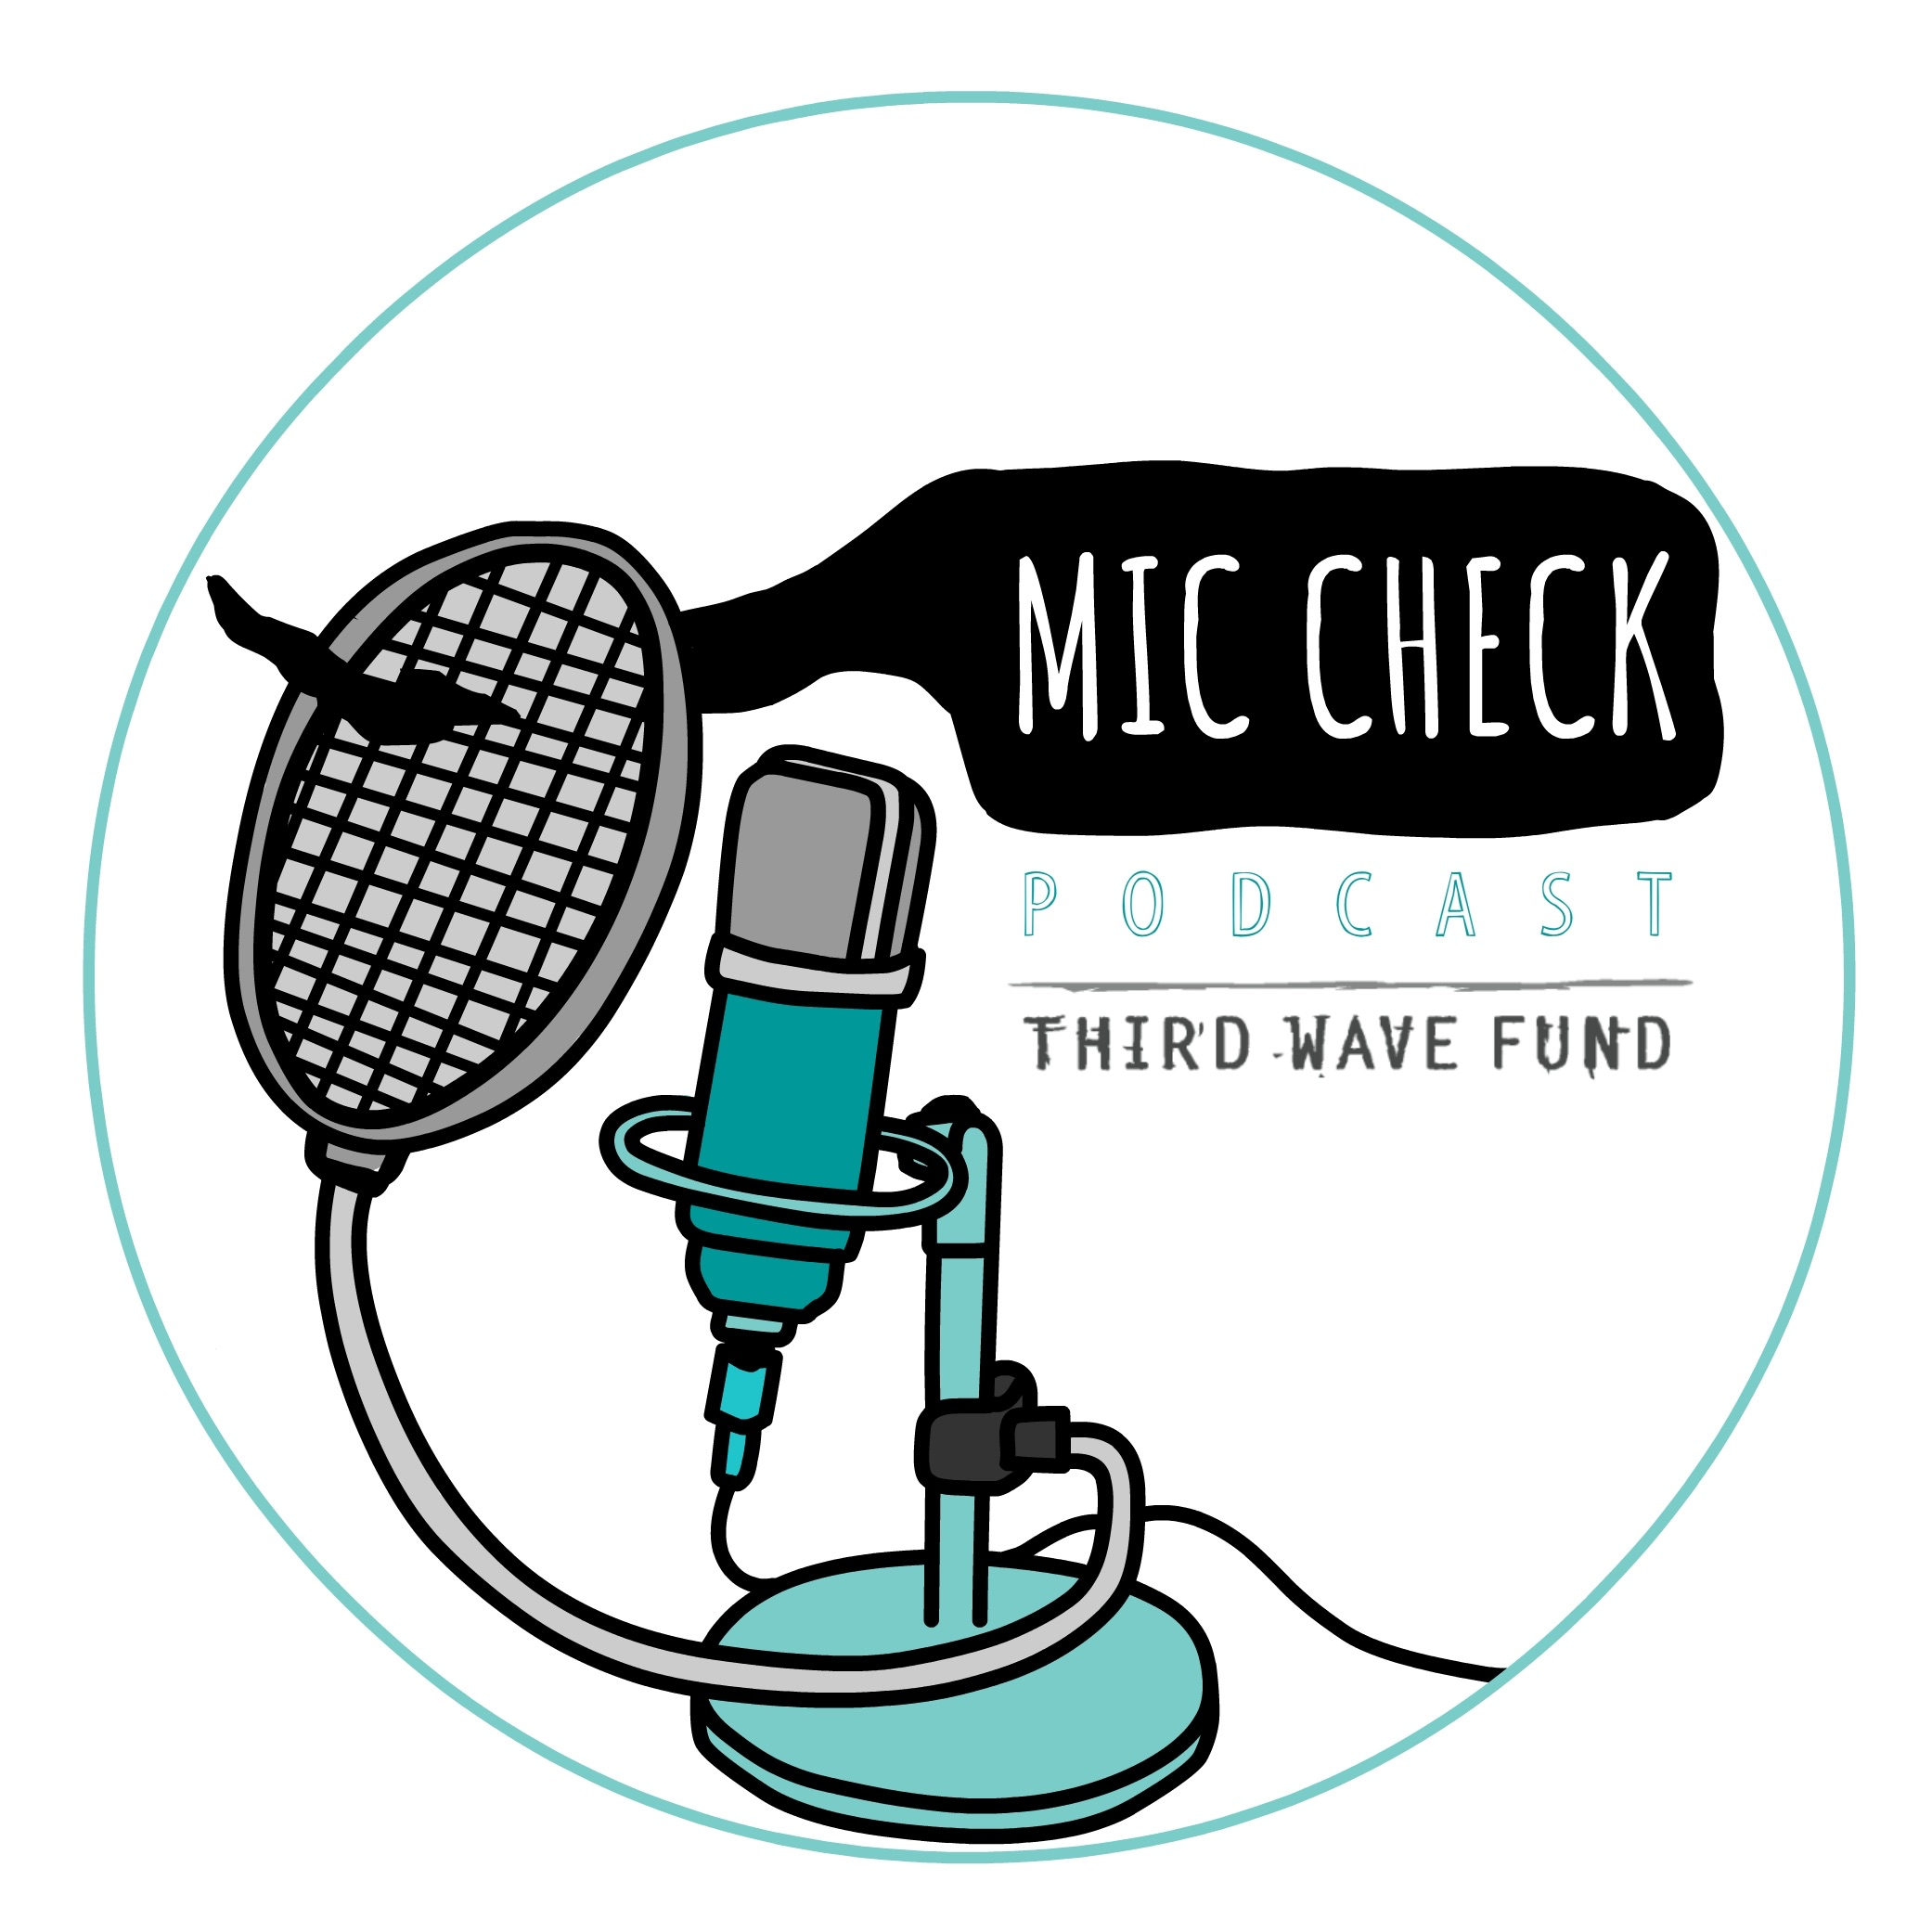 Mic Check! Podcast